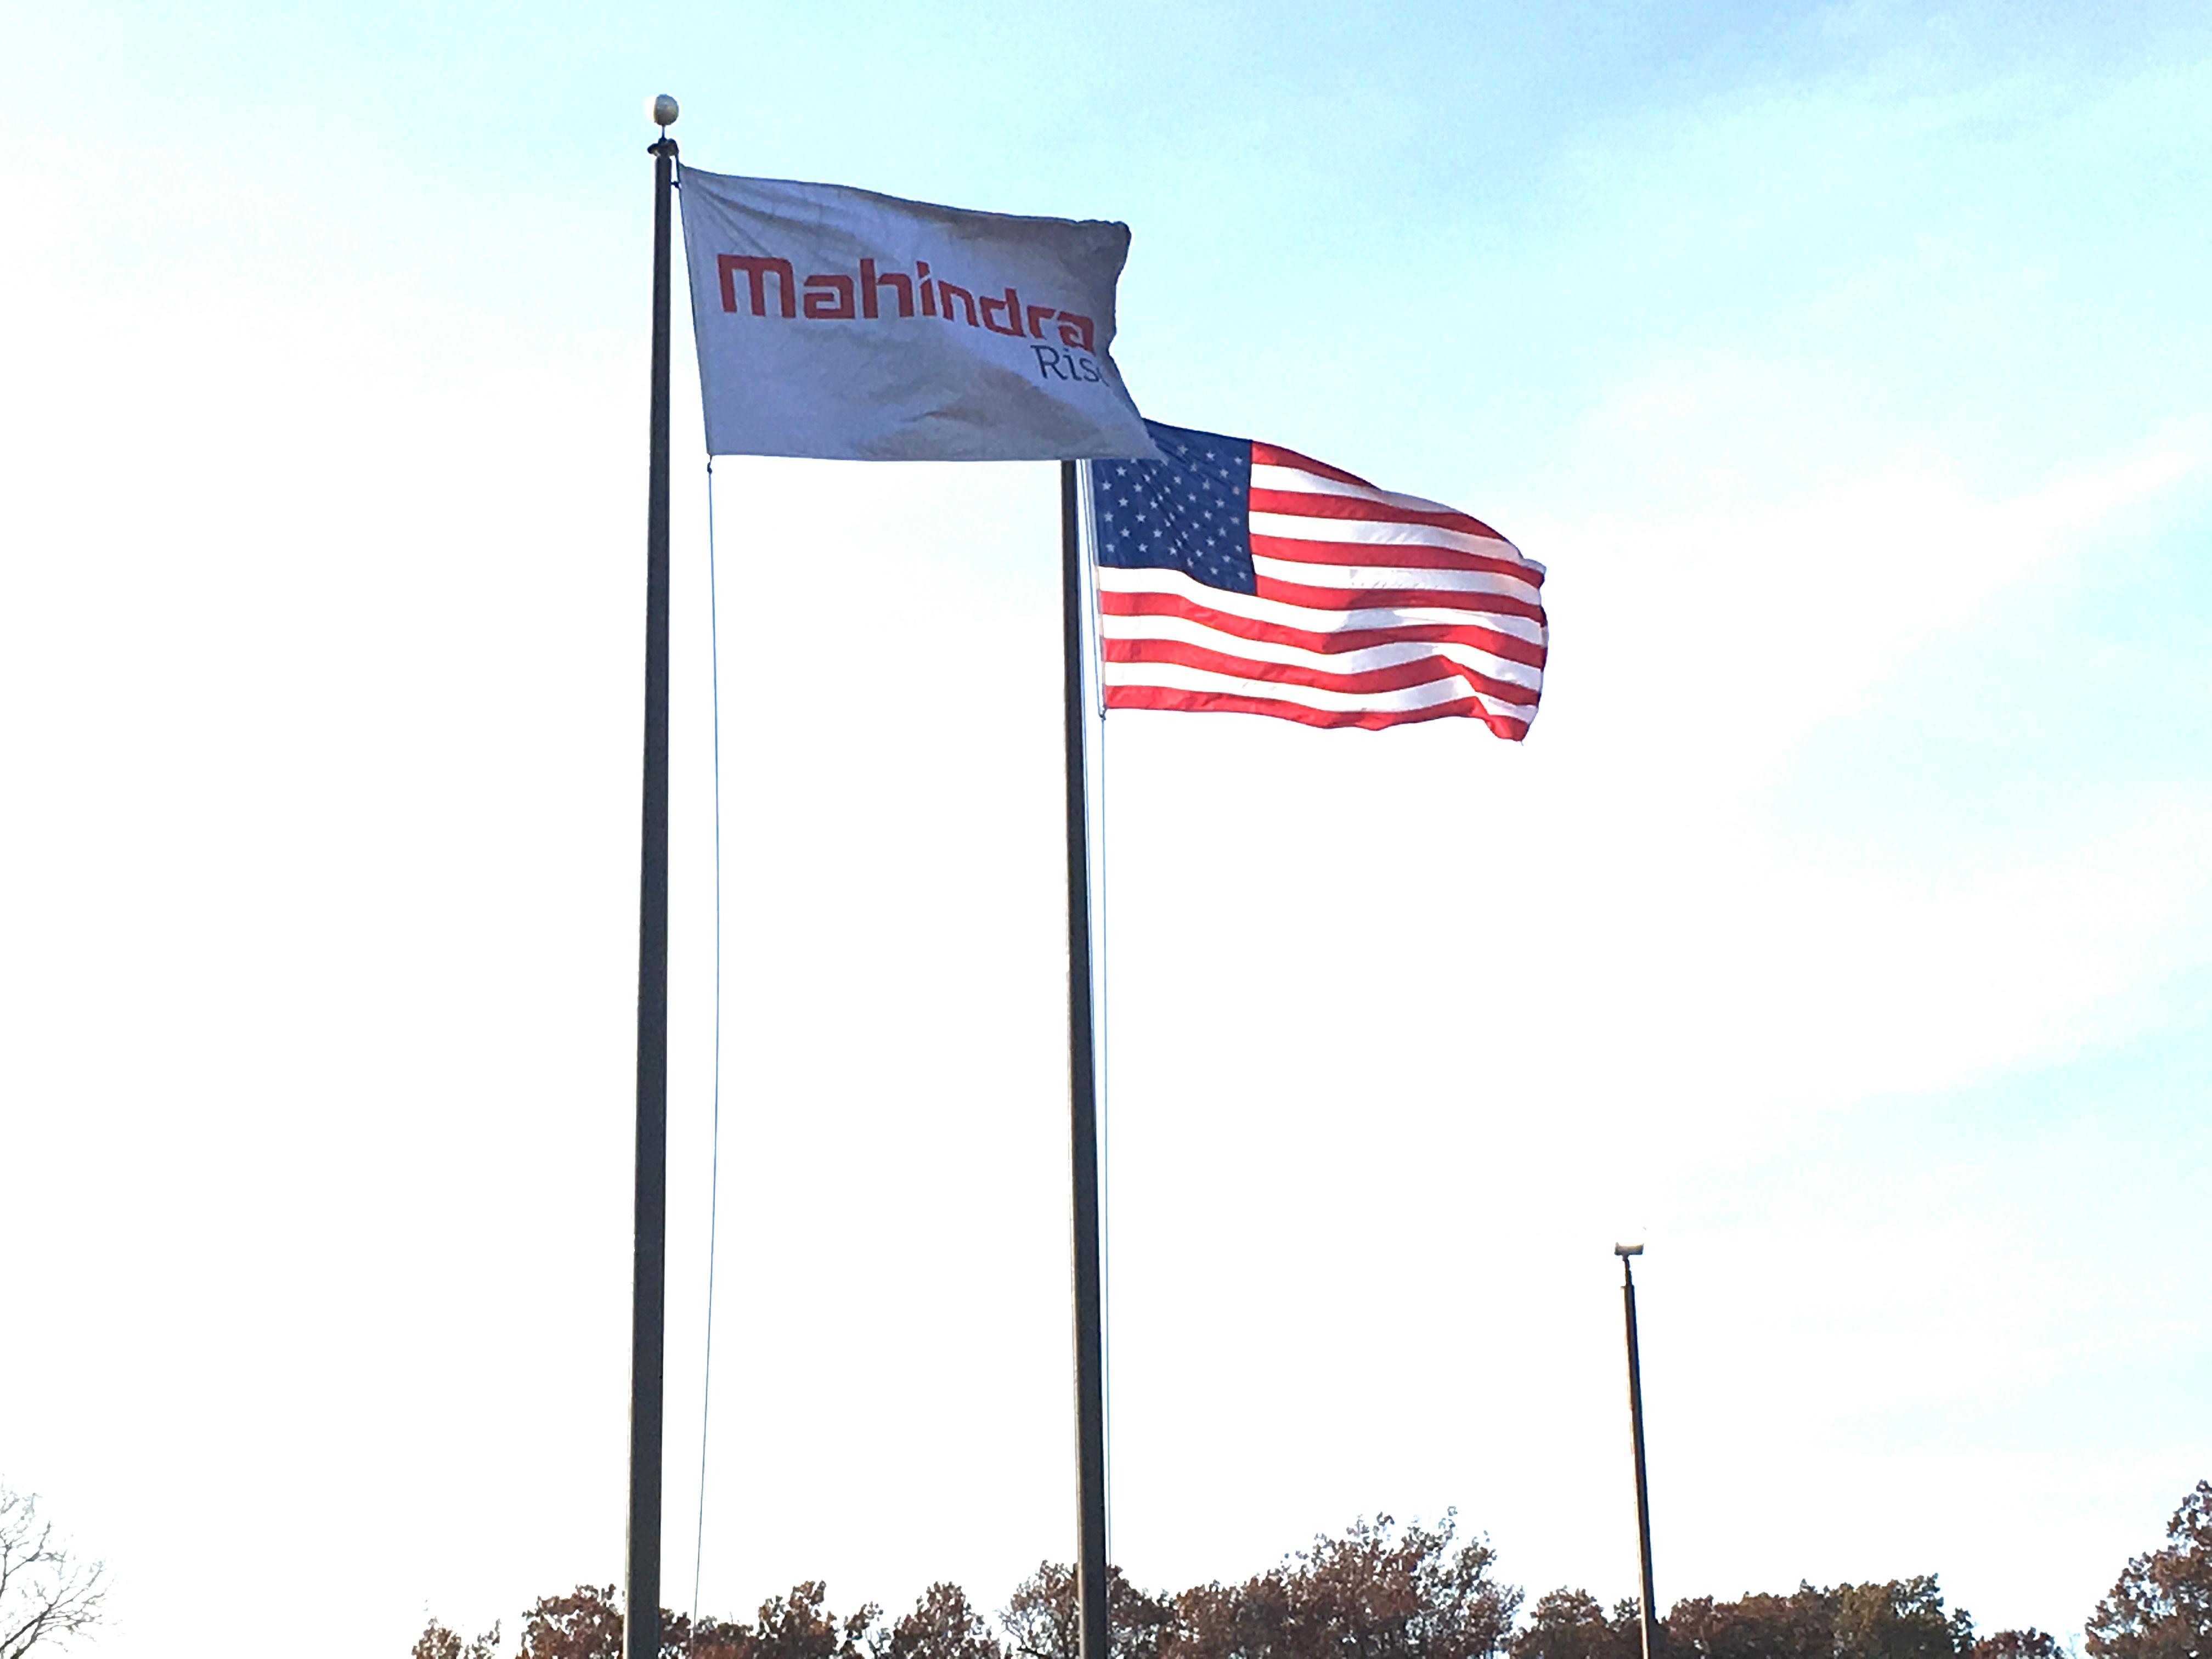 Mahindra Flag with the US